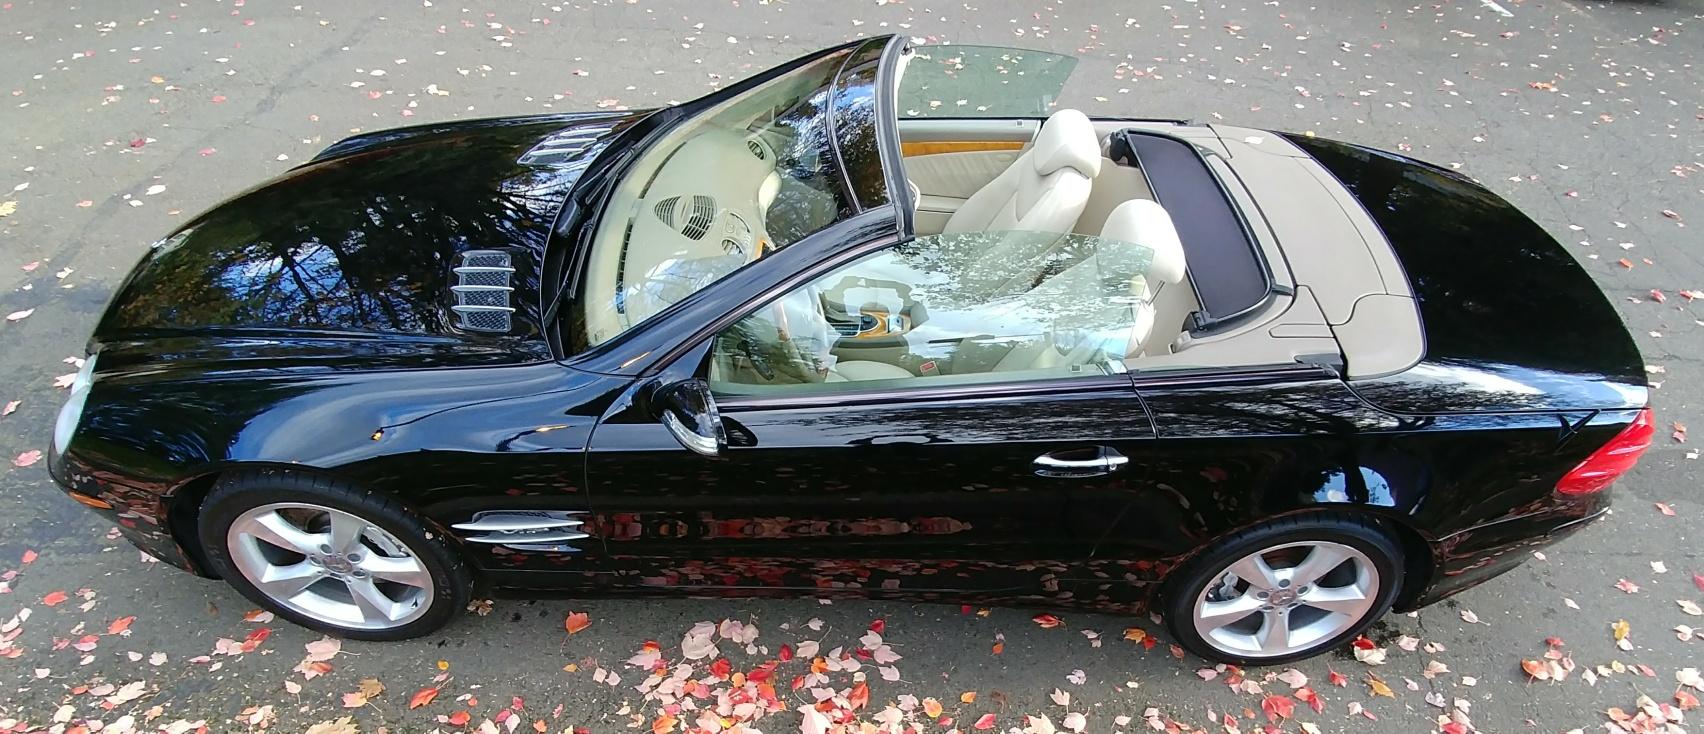 2004 Mercedes Benz SL600 V12 Twin Turbo